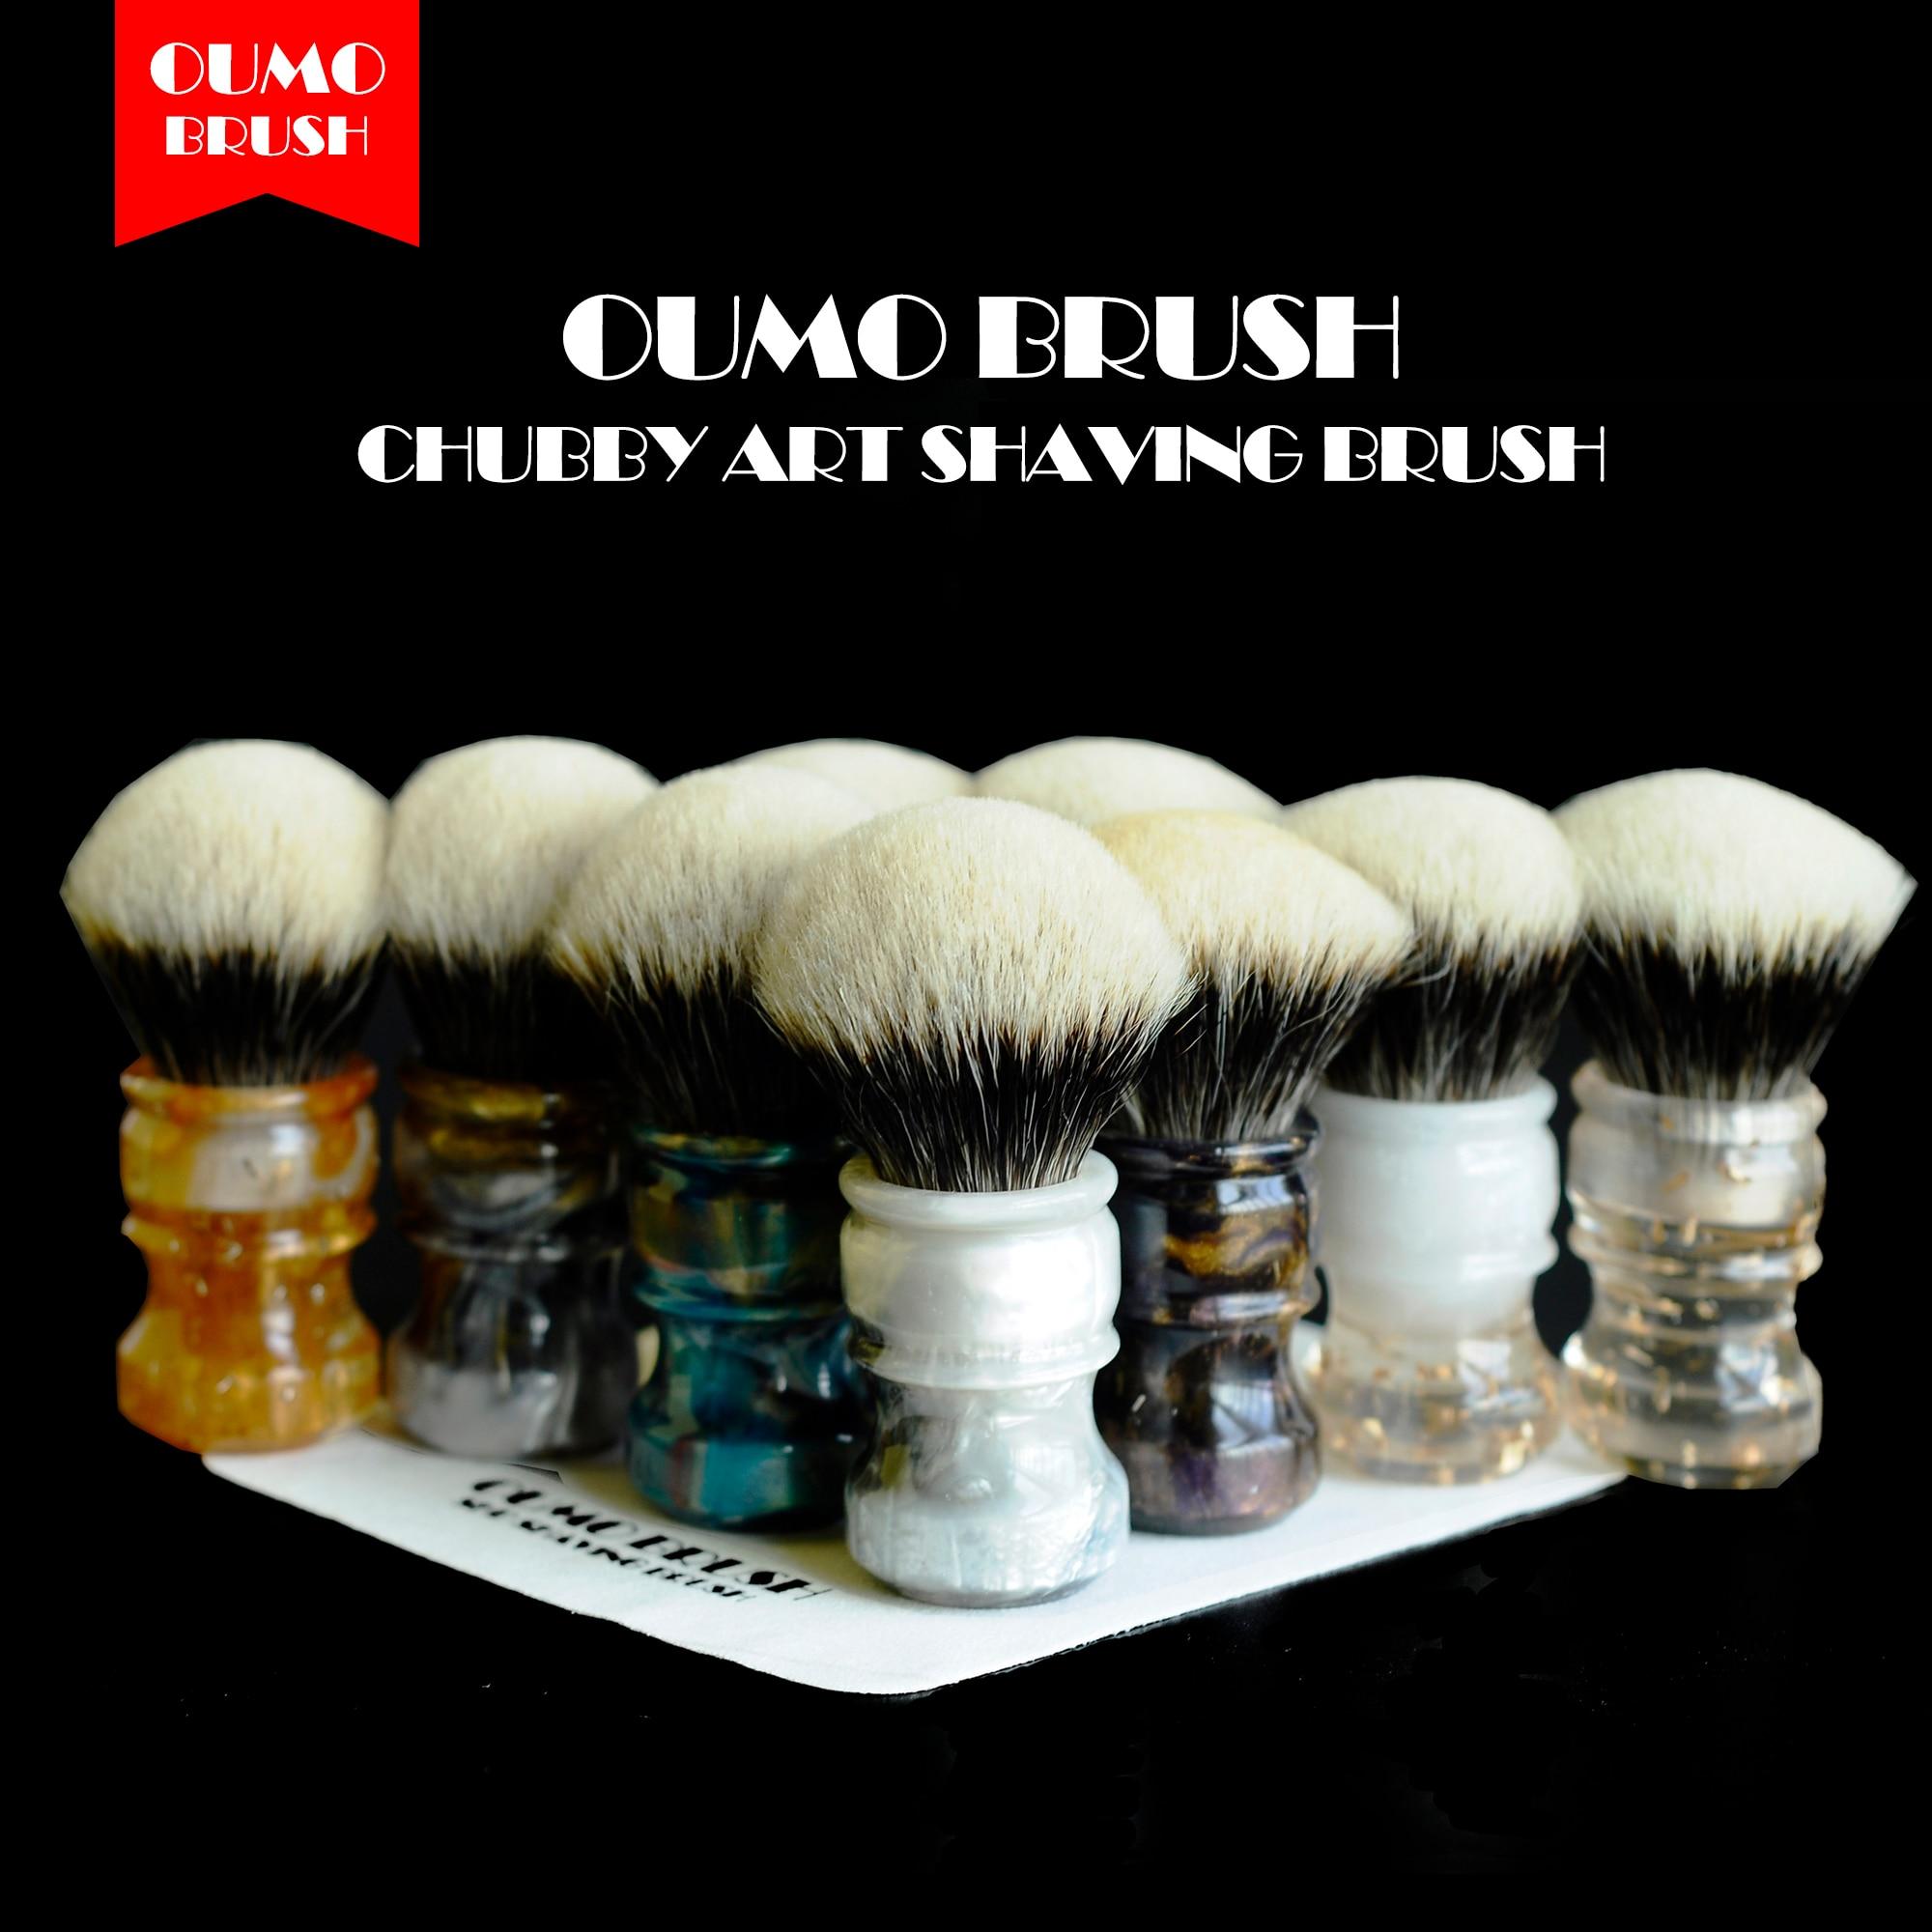 OUMO BRUSH  2019/8/1 CHUBBY  Art shaving brush with SHD fan Manchuria badger knot gel city 26MM-in Shaving Brush from Beauty & Health